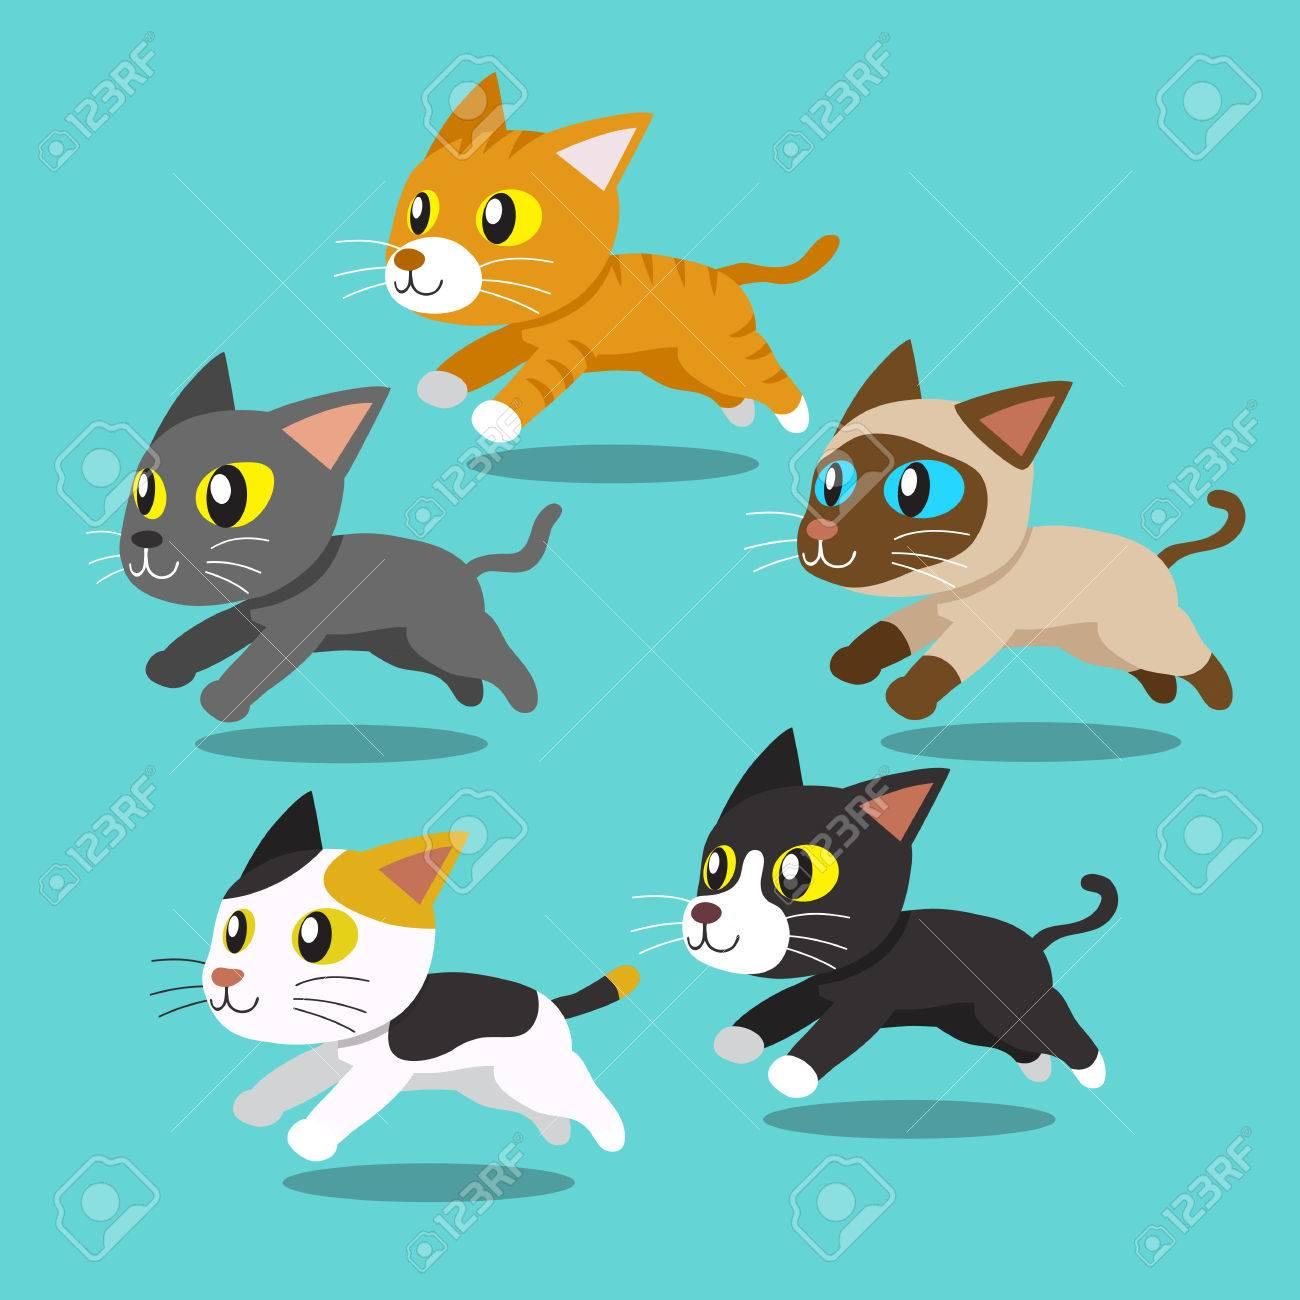 Cartoon Cats Running Royalty Free Cliparts Vectors And Stock Illustration Image 56791567